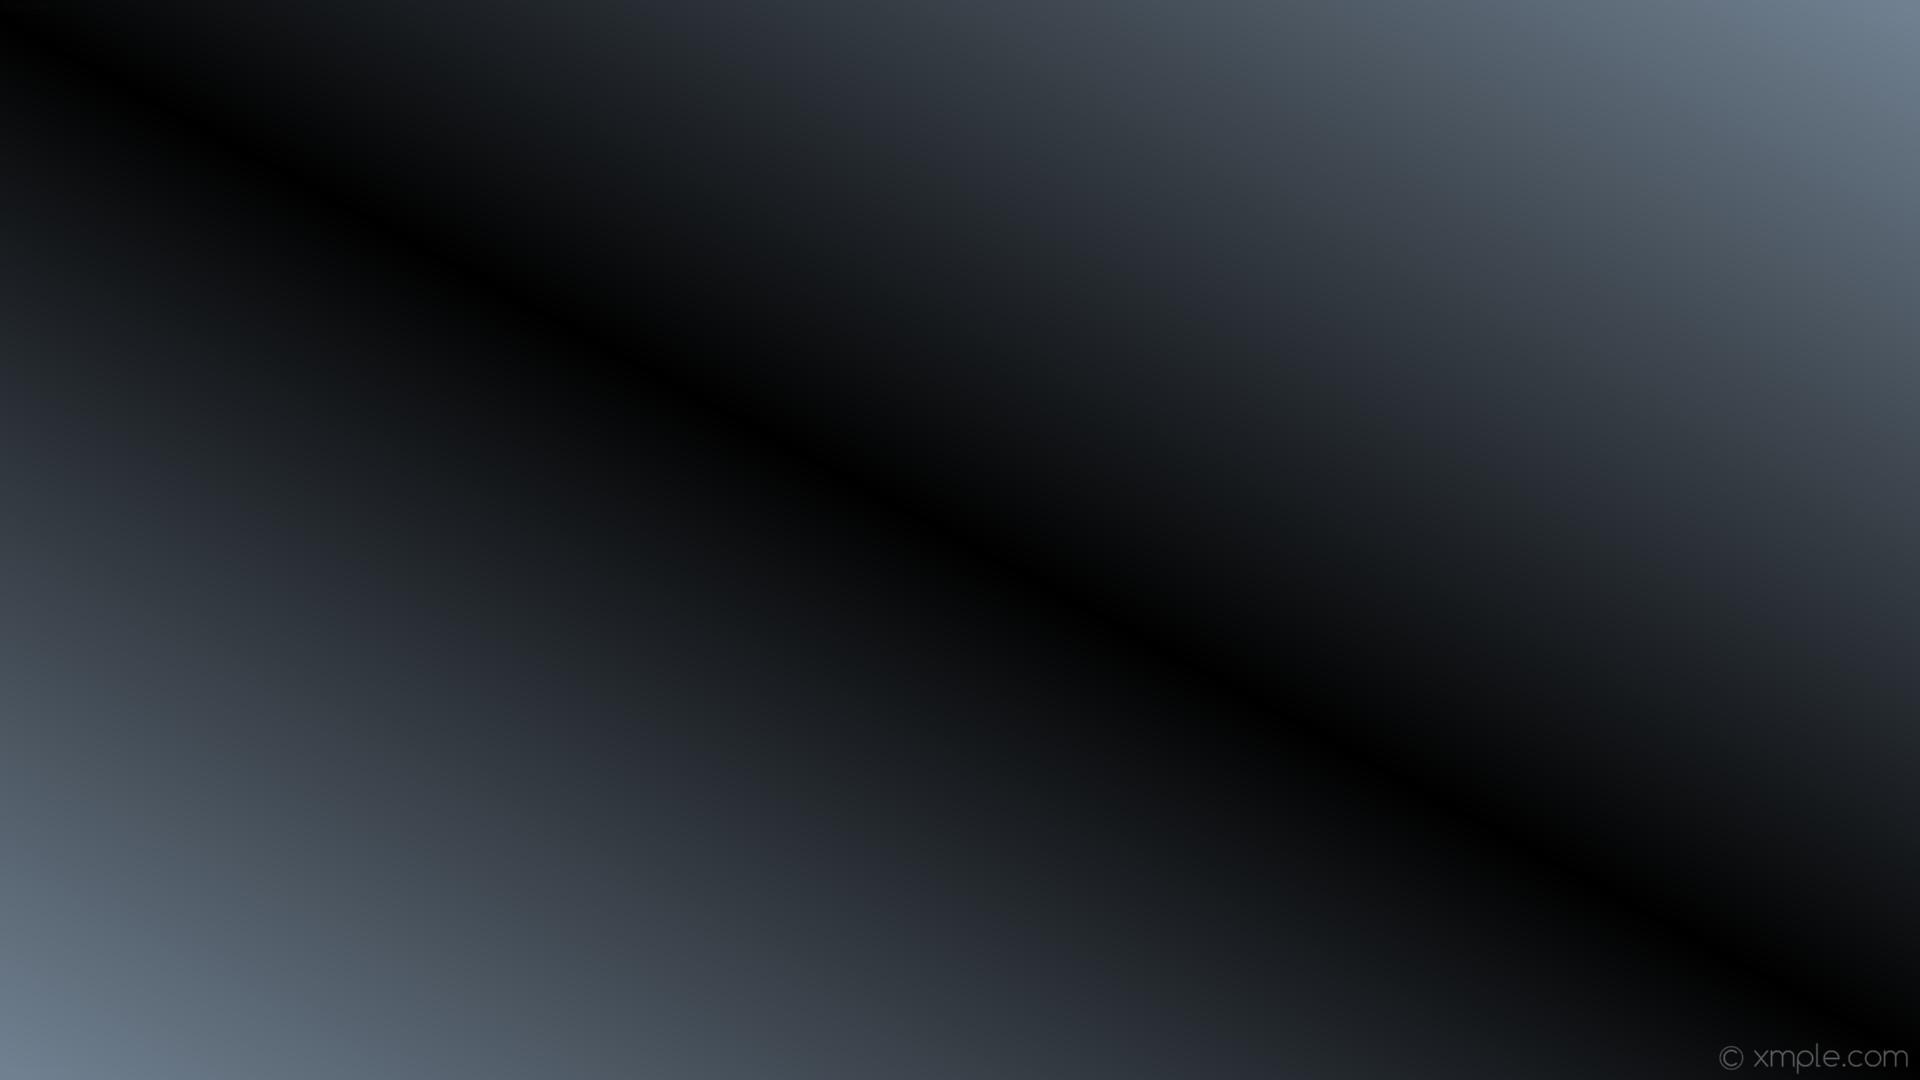 Wallpaper linear yellow highlight gradient black #000000 #ffd700 .